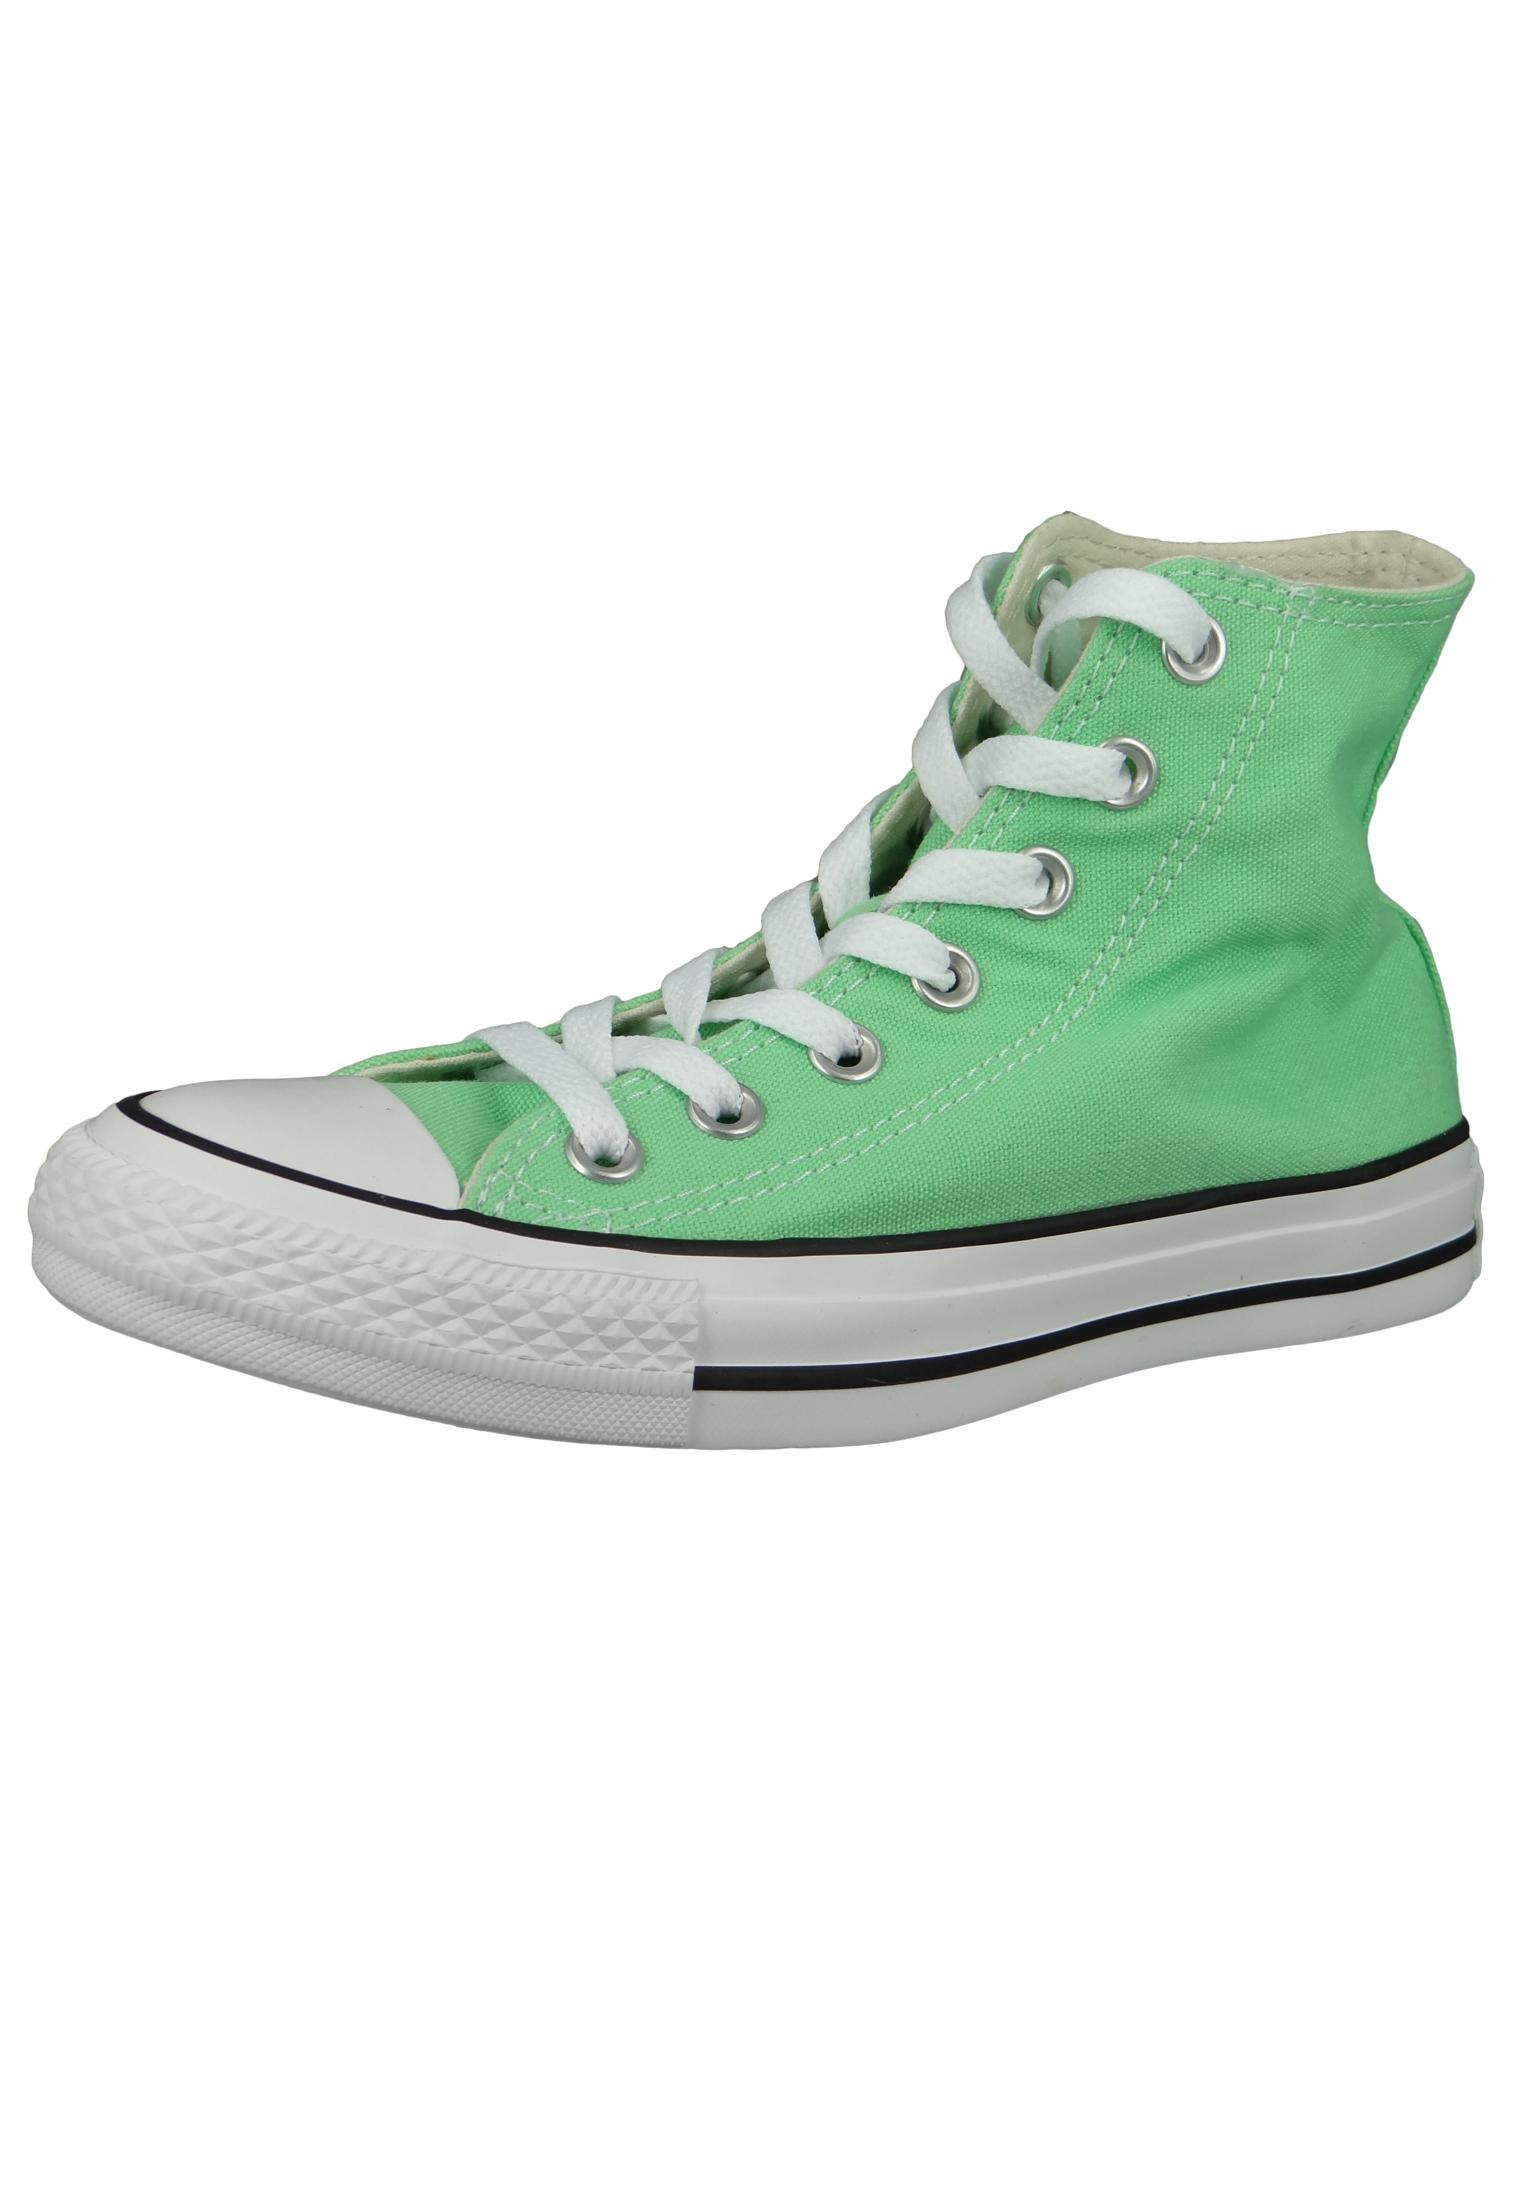 Converse Chucks. Mint.